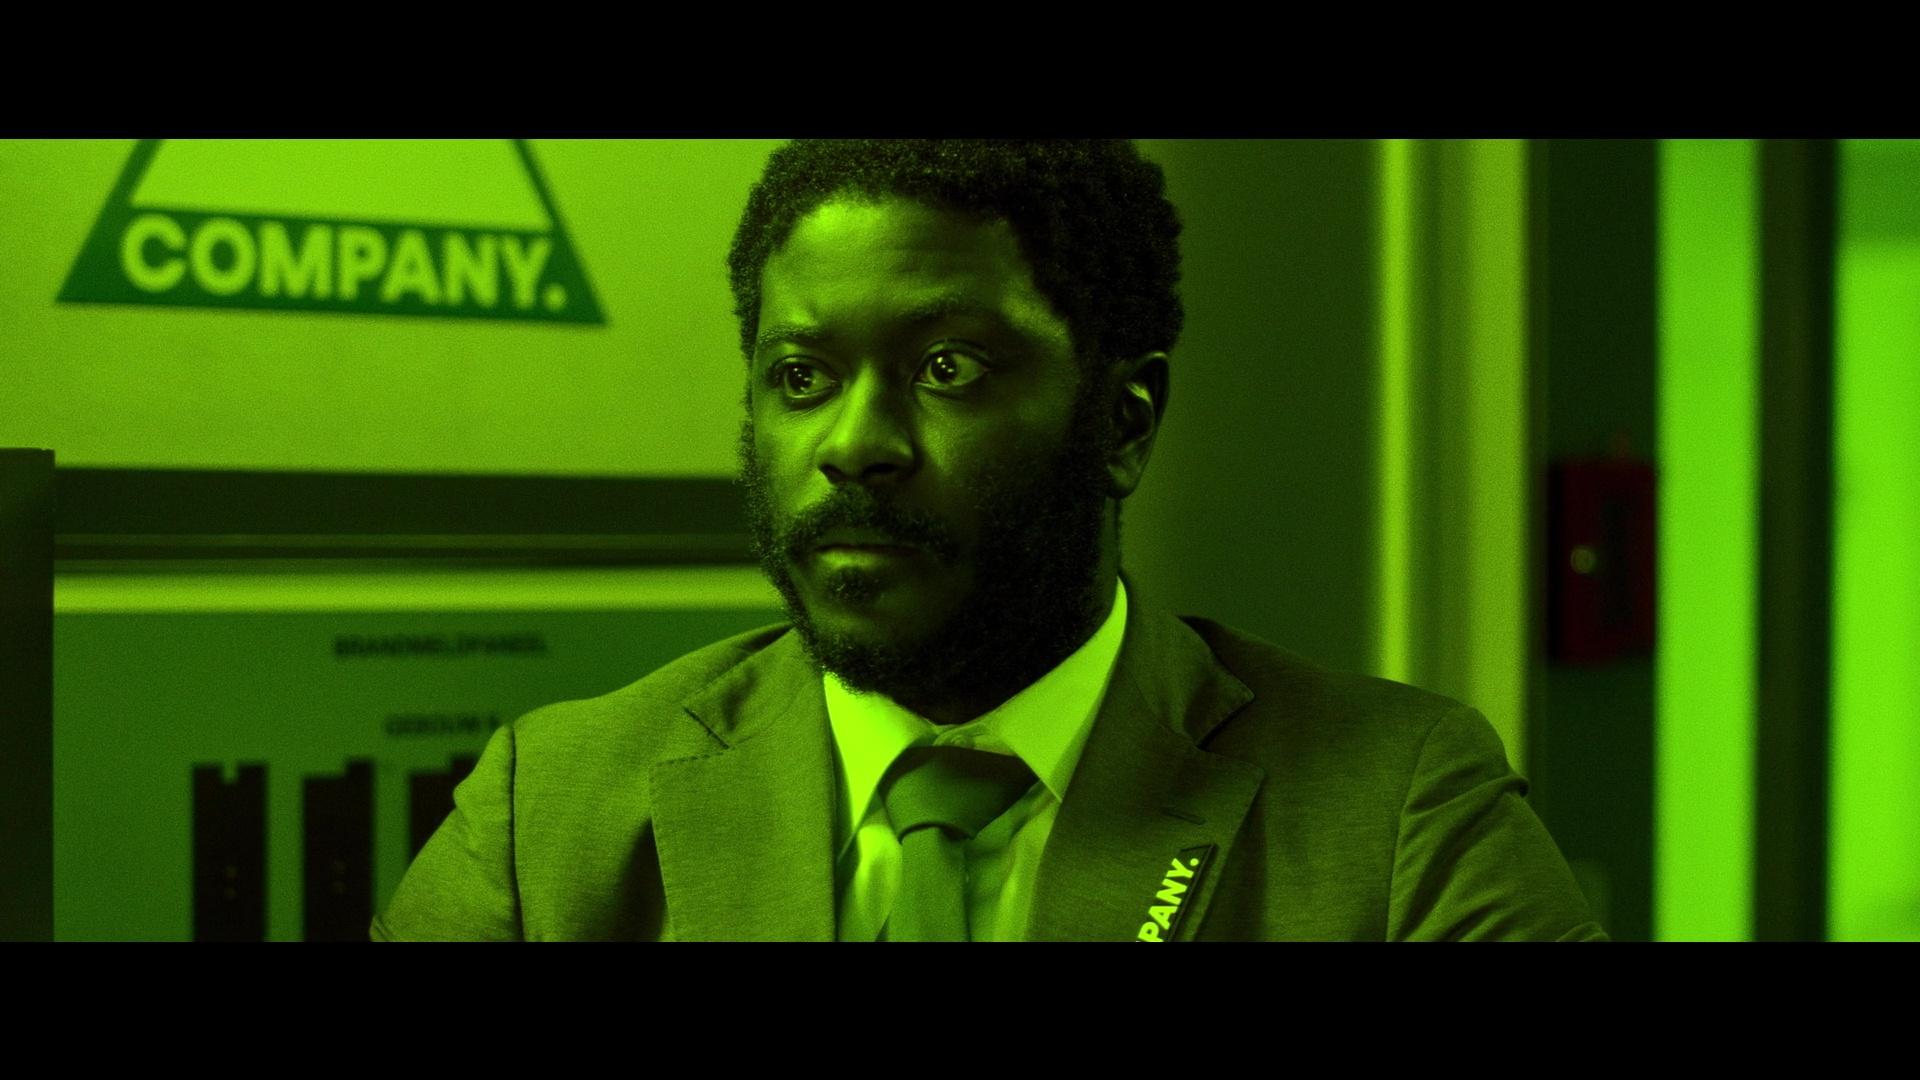 En modo asesino (2020) 1080p BRrip Latino